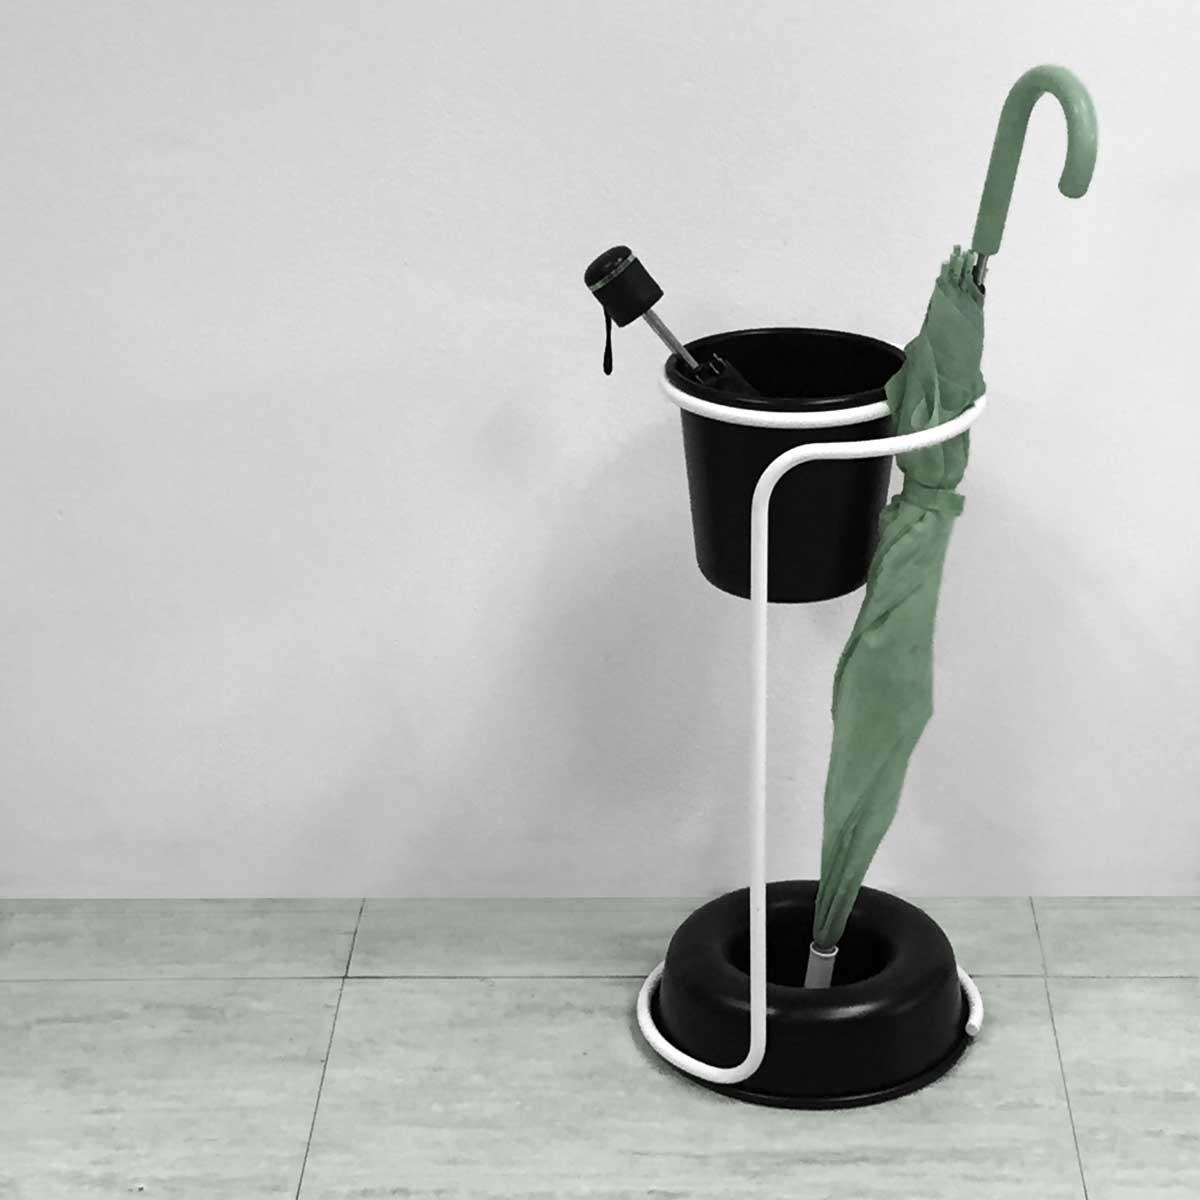 Francesco-Ruffa_Officinanove_Boa_umbrellastand_design_1